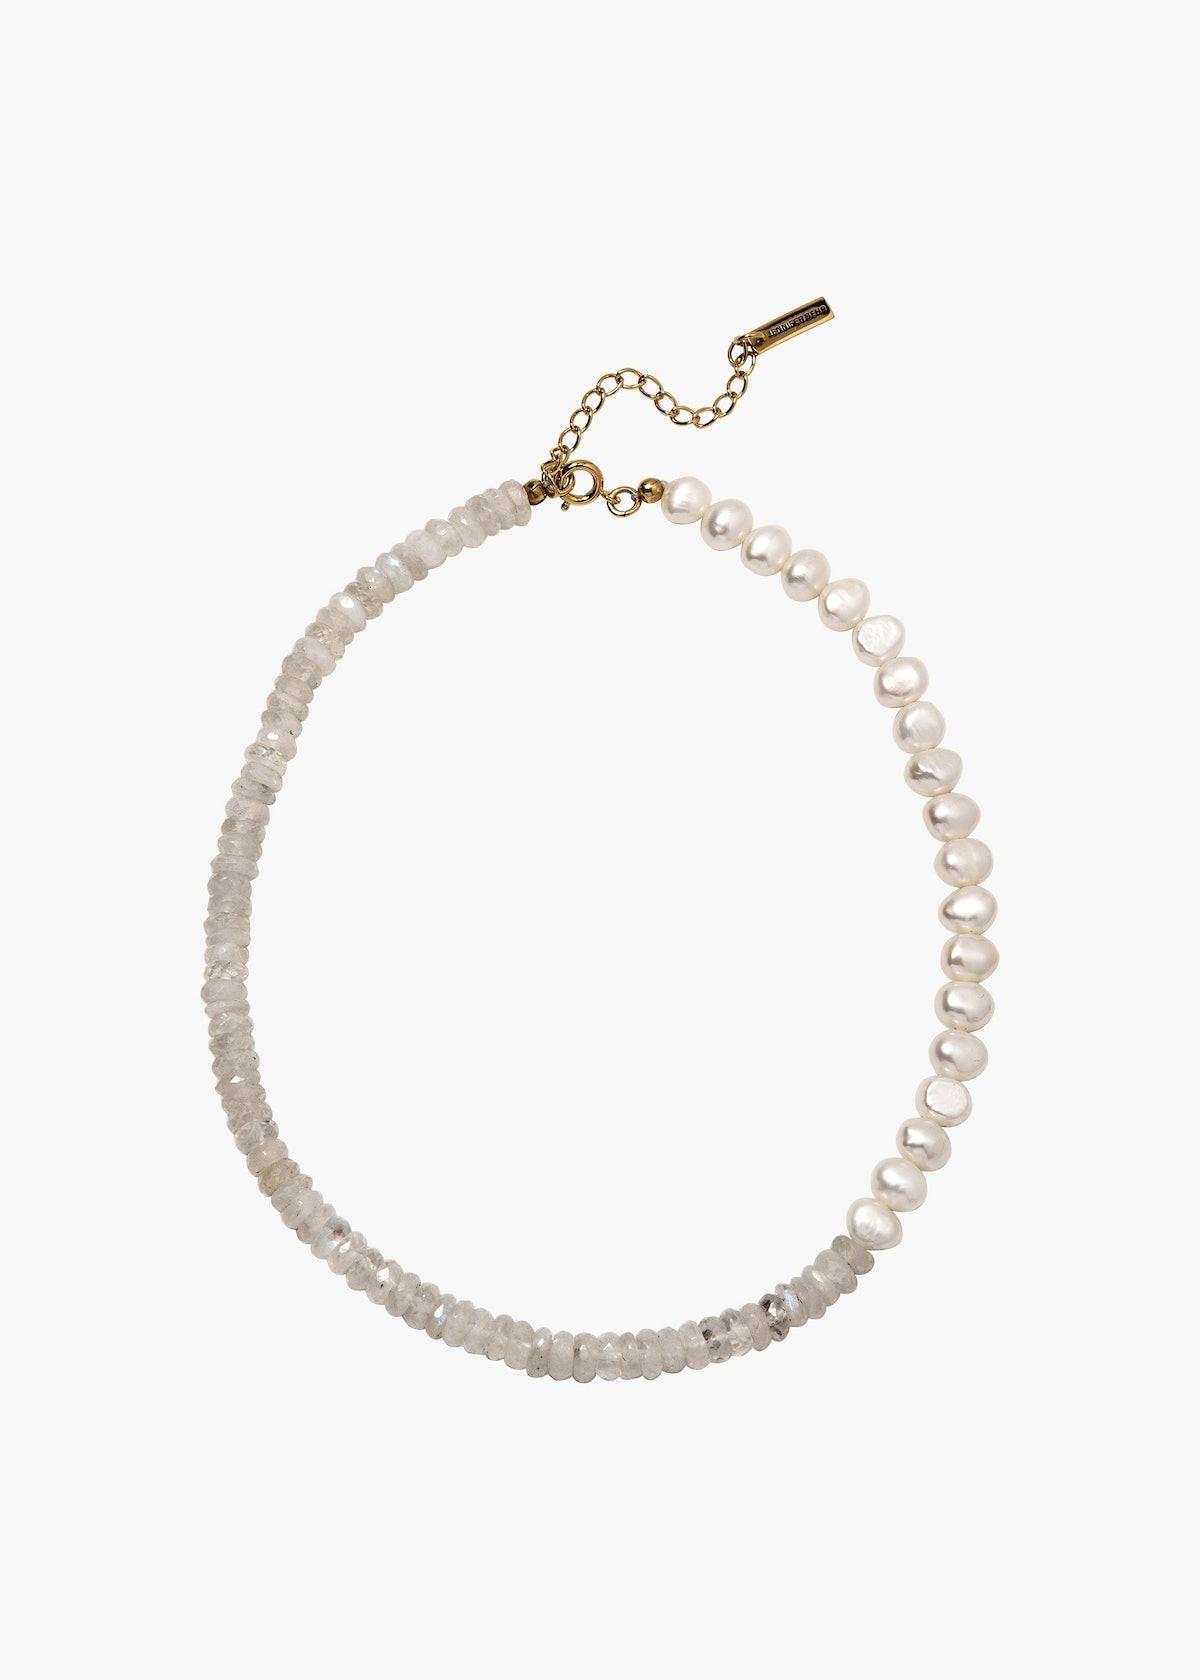 Jennifer Behr beaded necklace